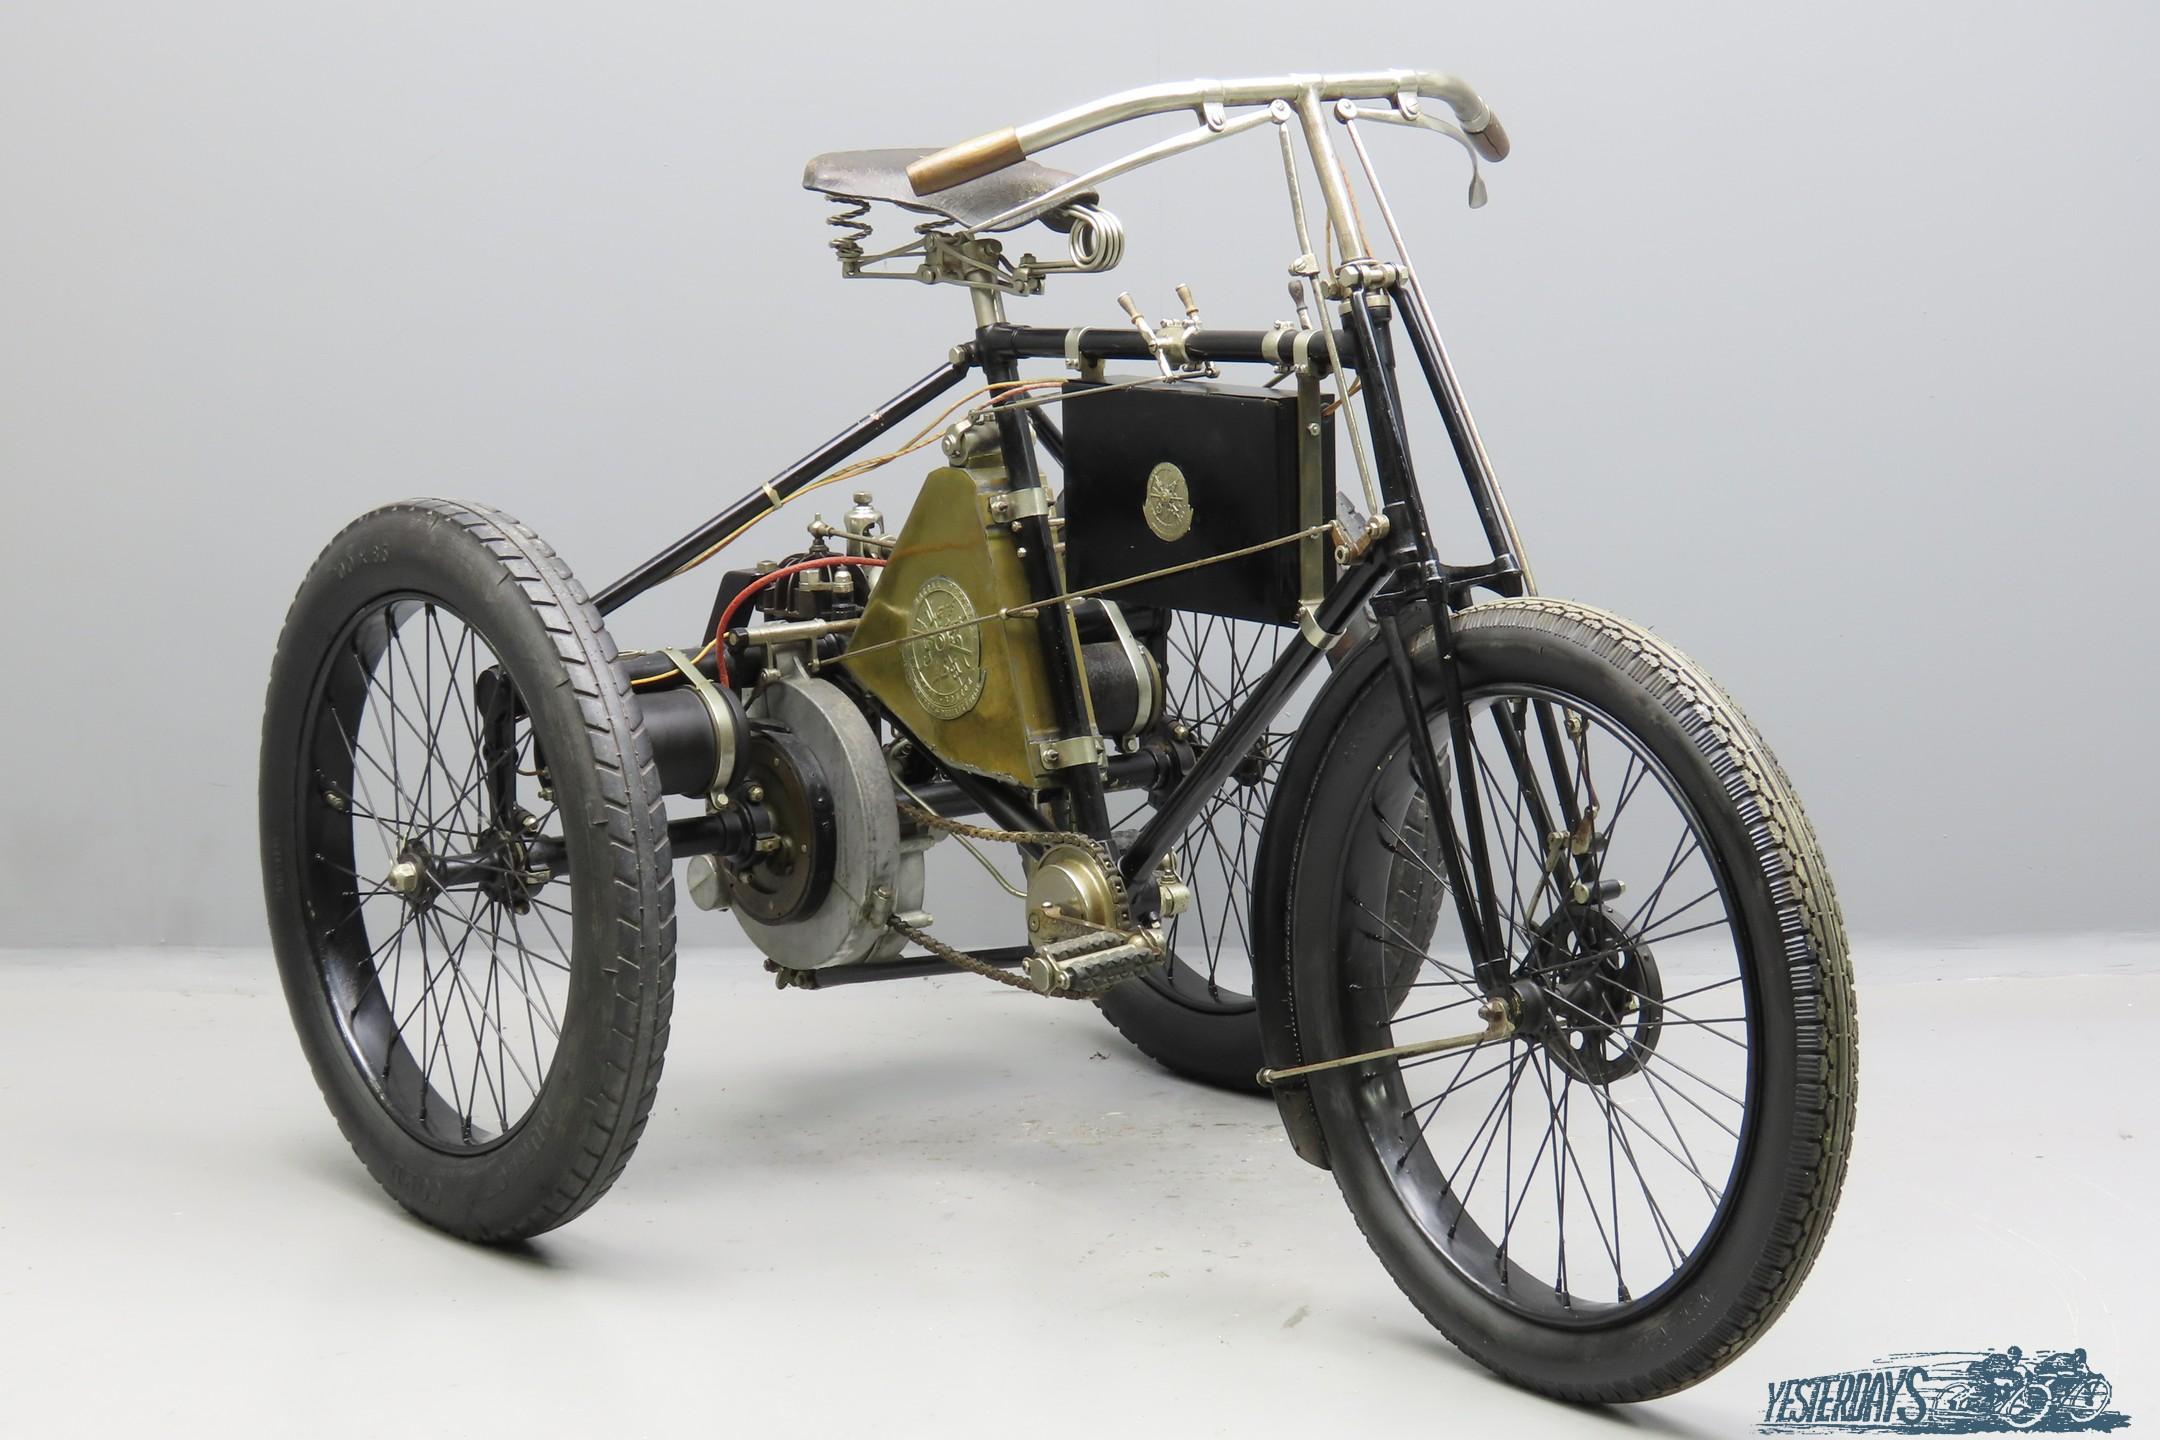 De Dion Bouton 1899 2¼hp 269cc 1 cyl aiv  3009